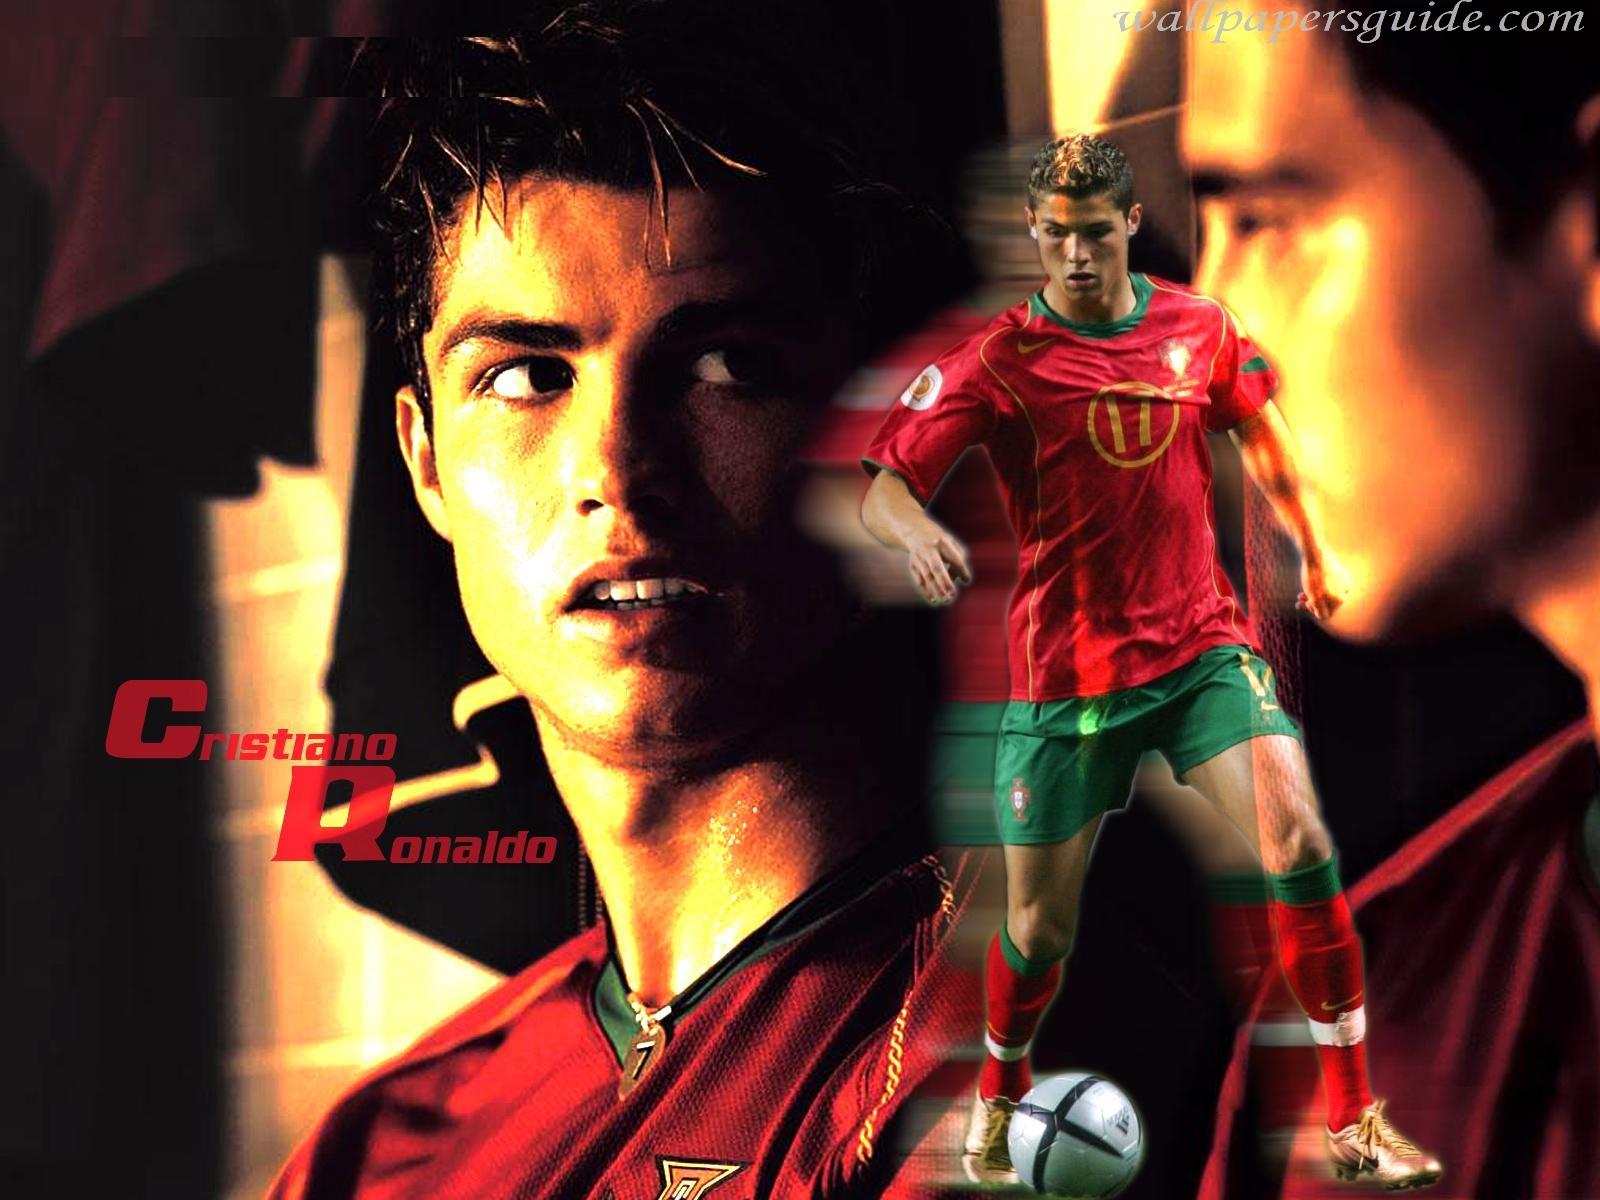 http://3.bp.blogspot.com/-StJZvJHFJT4/Td2oZLsRyXI/AAAAAAAAAO4/hGw_SiBQaiw/s1600/Cristiano-Ronaldo-HD-Wallpapers-2011.jpg